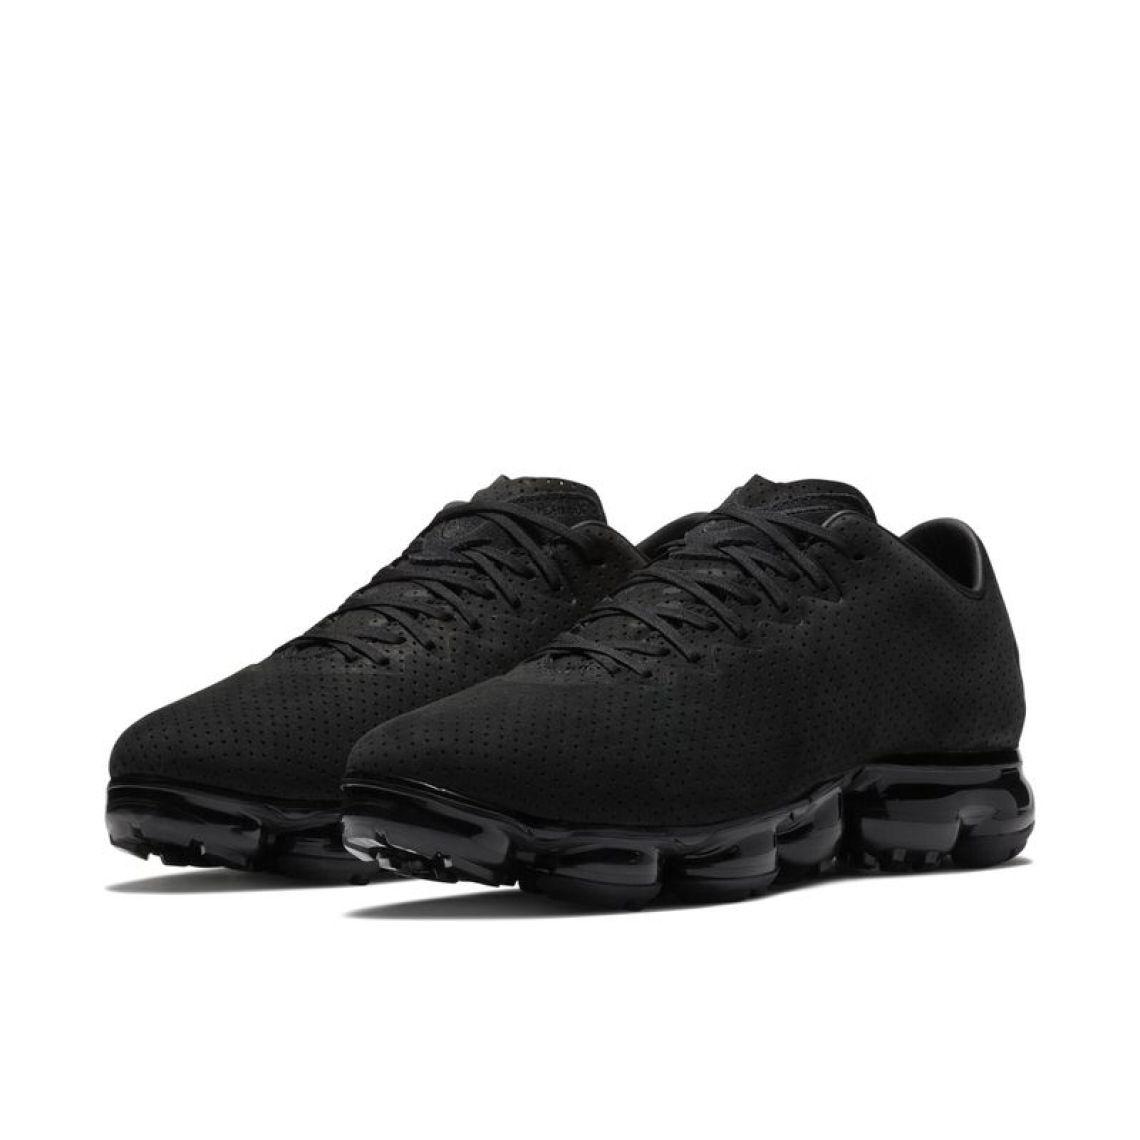 2fd72d48417 Nike Air VaporMax Suede